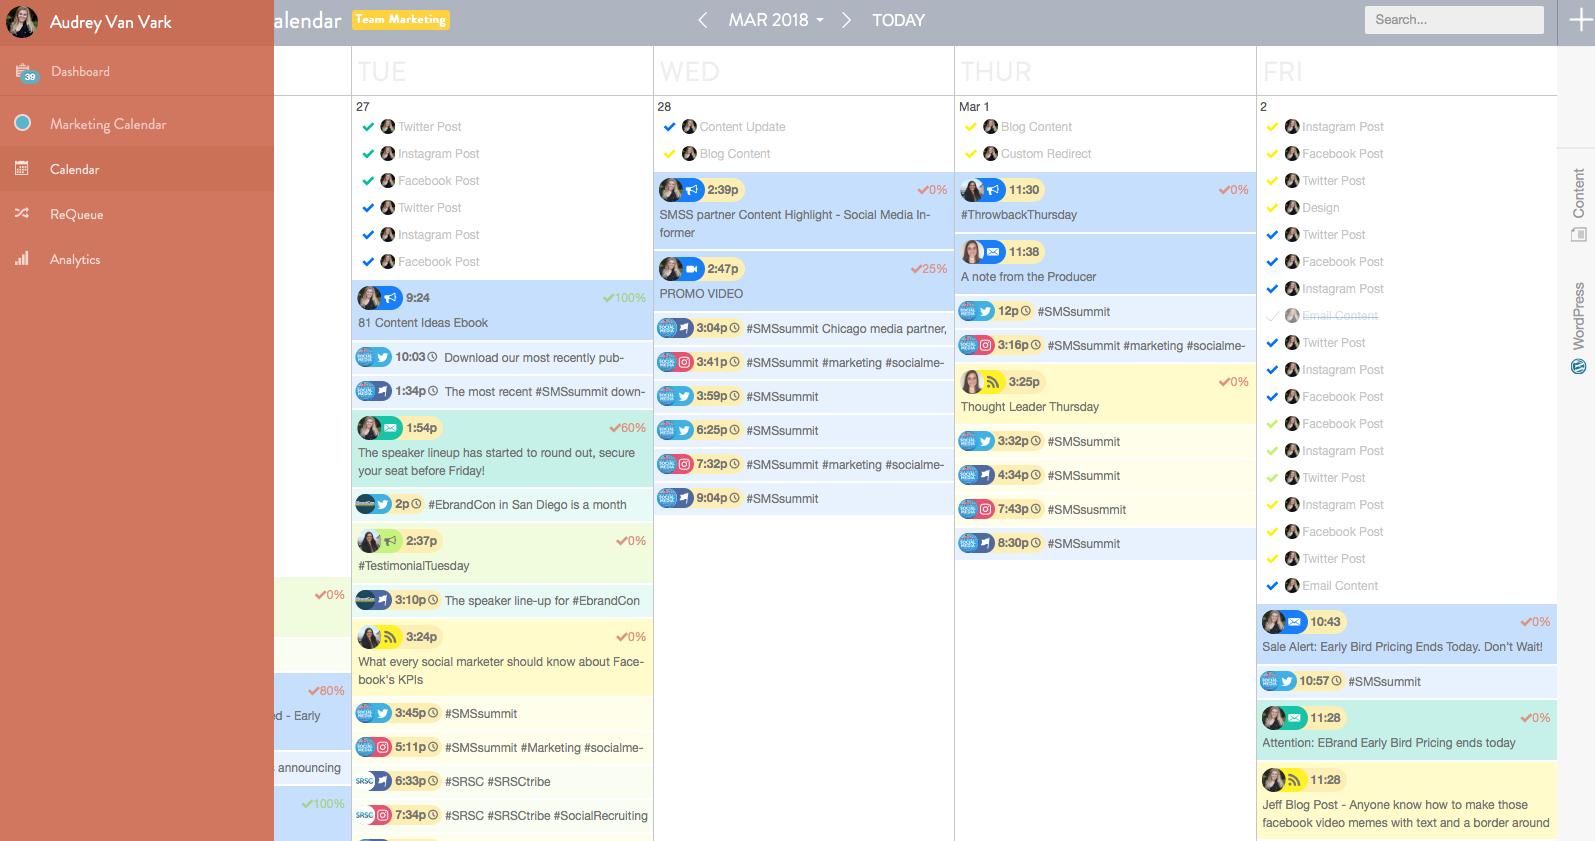 CoSchedule - Social Media Scheduling Tools